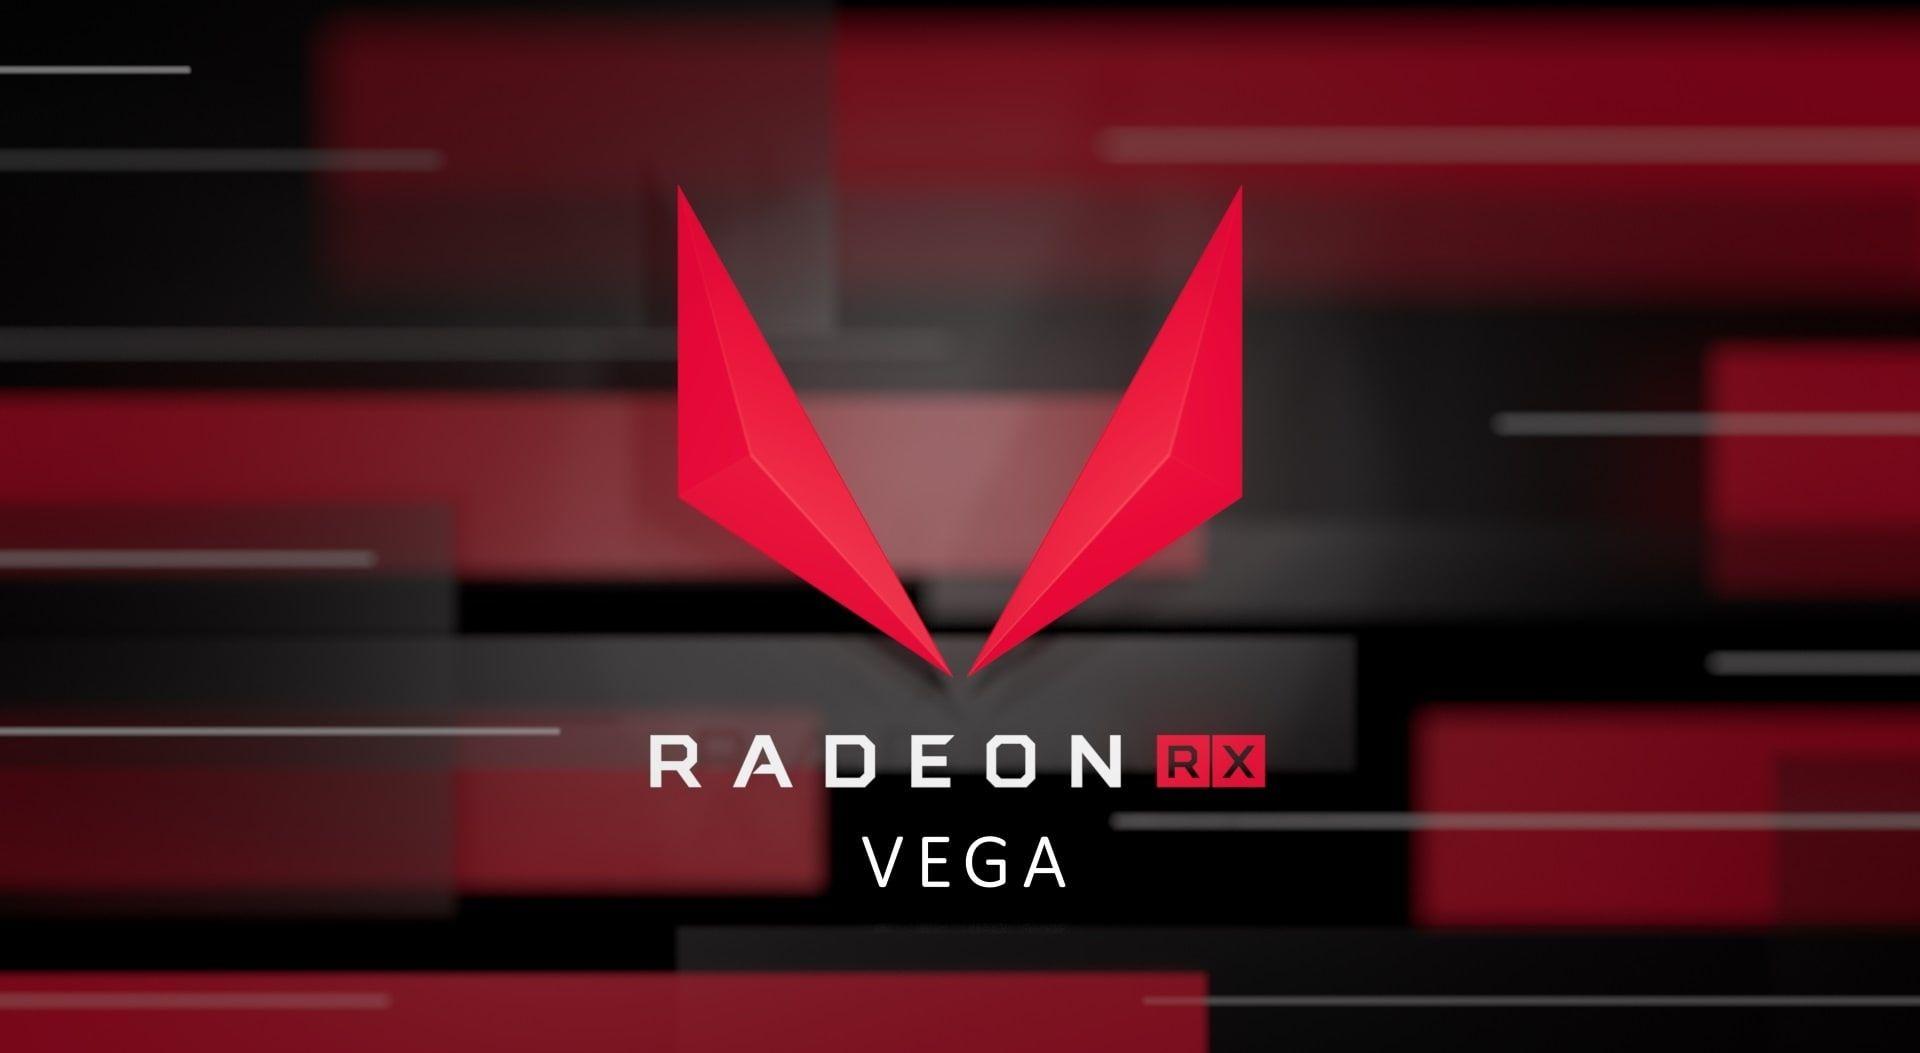 Radeon Vega Graphics Computers Others Radeon Vega Amd Graphics Graphic Card Computer Games Gaming Hardware 1080p Wallpaper H In 2020 Graphic Card Vega Amd